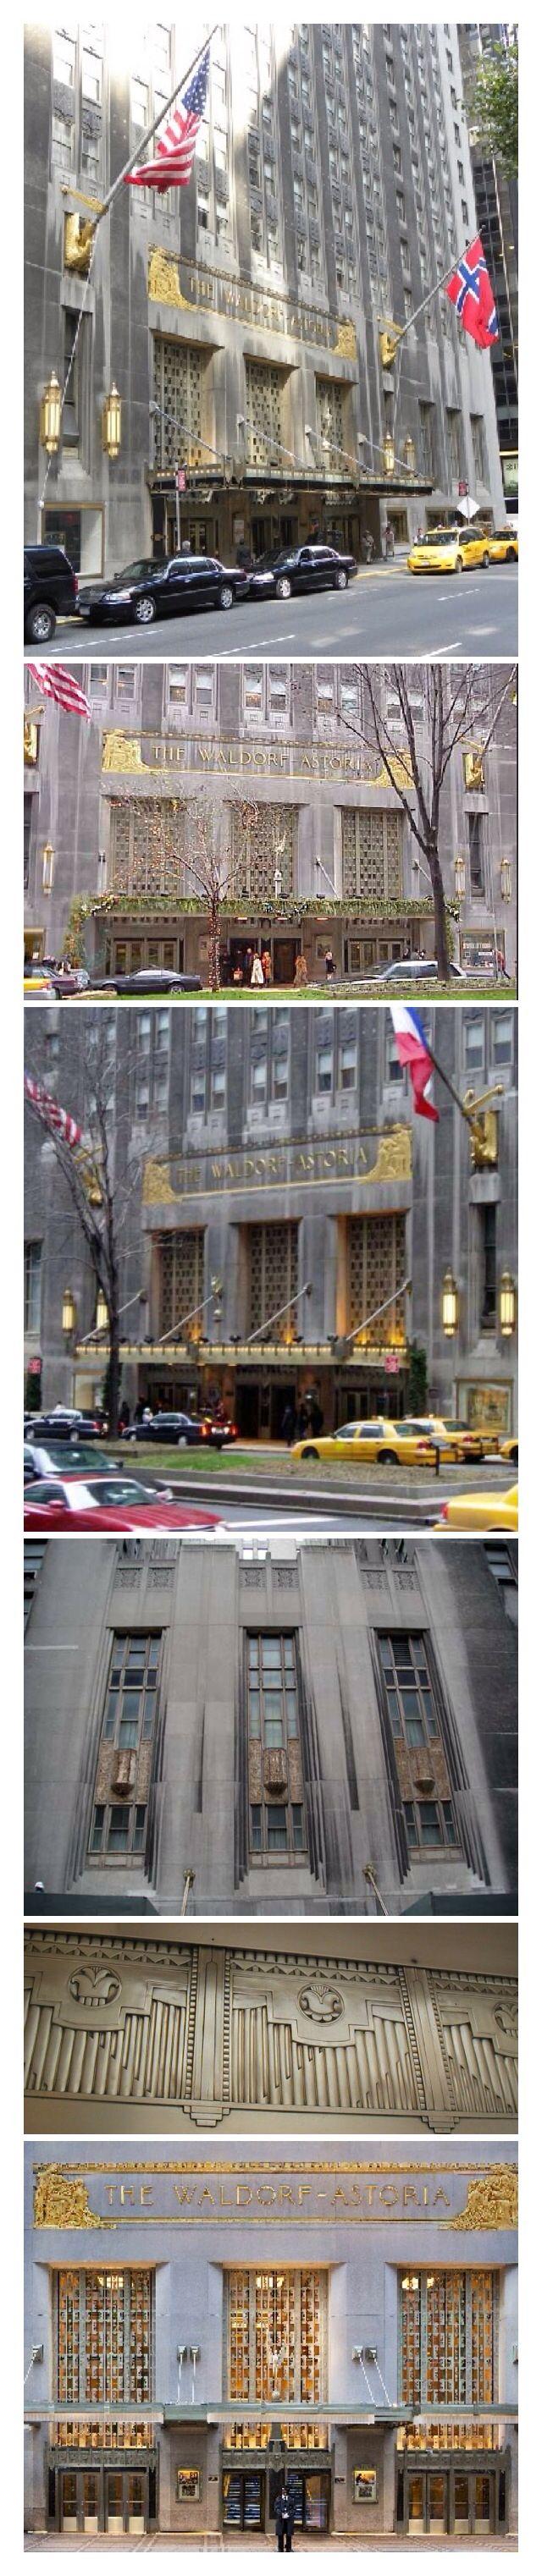 Luxury stay at The Waldorf Astoria Hotel New York City⭐️LUXURYdotcom |